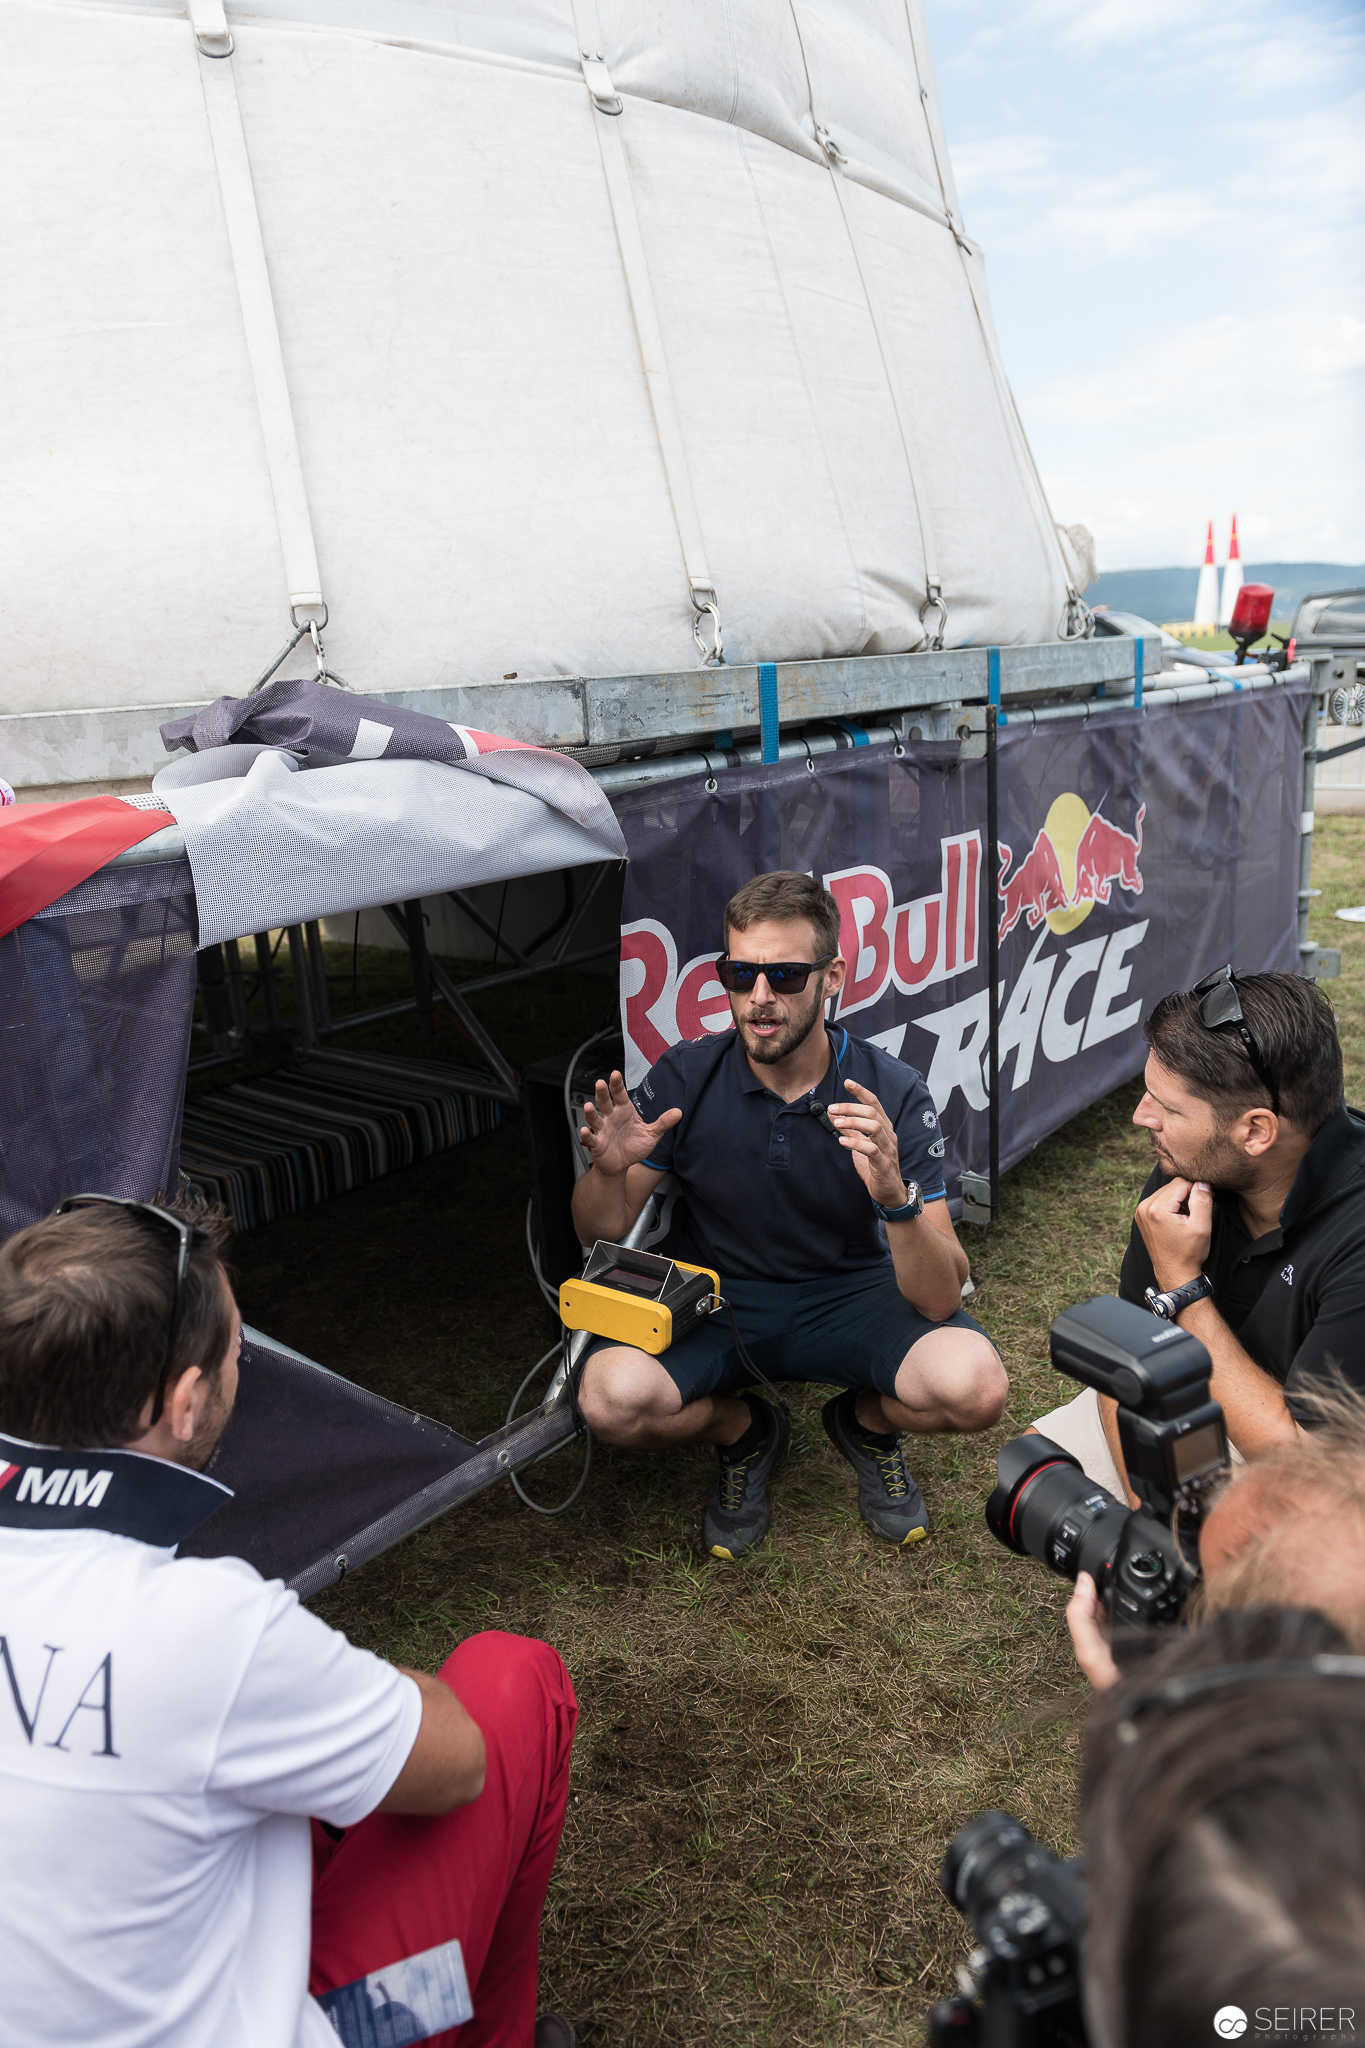 Pylonen-Tour, Red Bull Air Race 2018 Wiener Neustadt